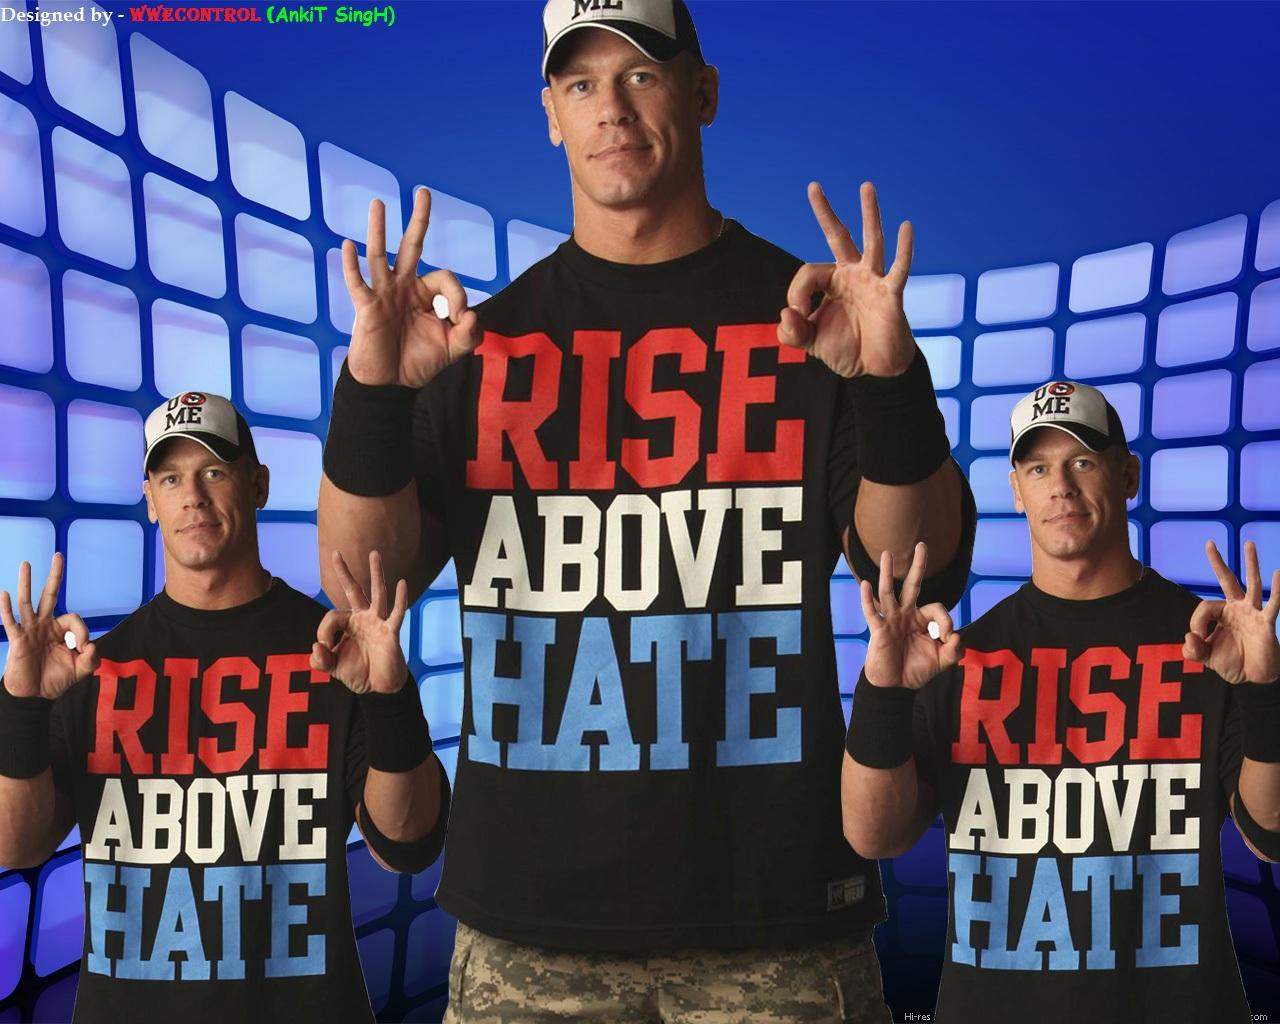 mashababko: Rise Above Hate Wallpaper Hd  mashababko: Ris...